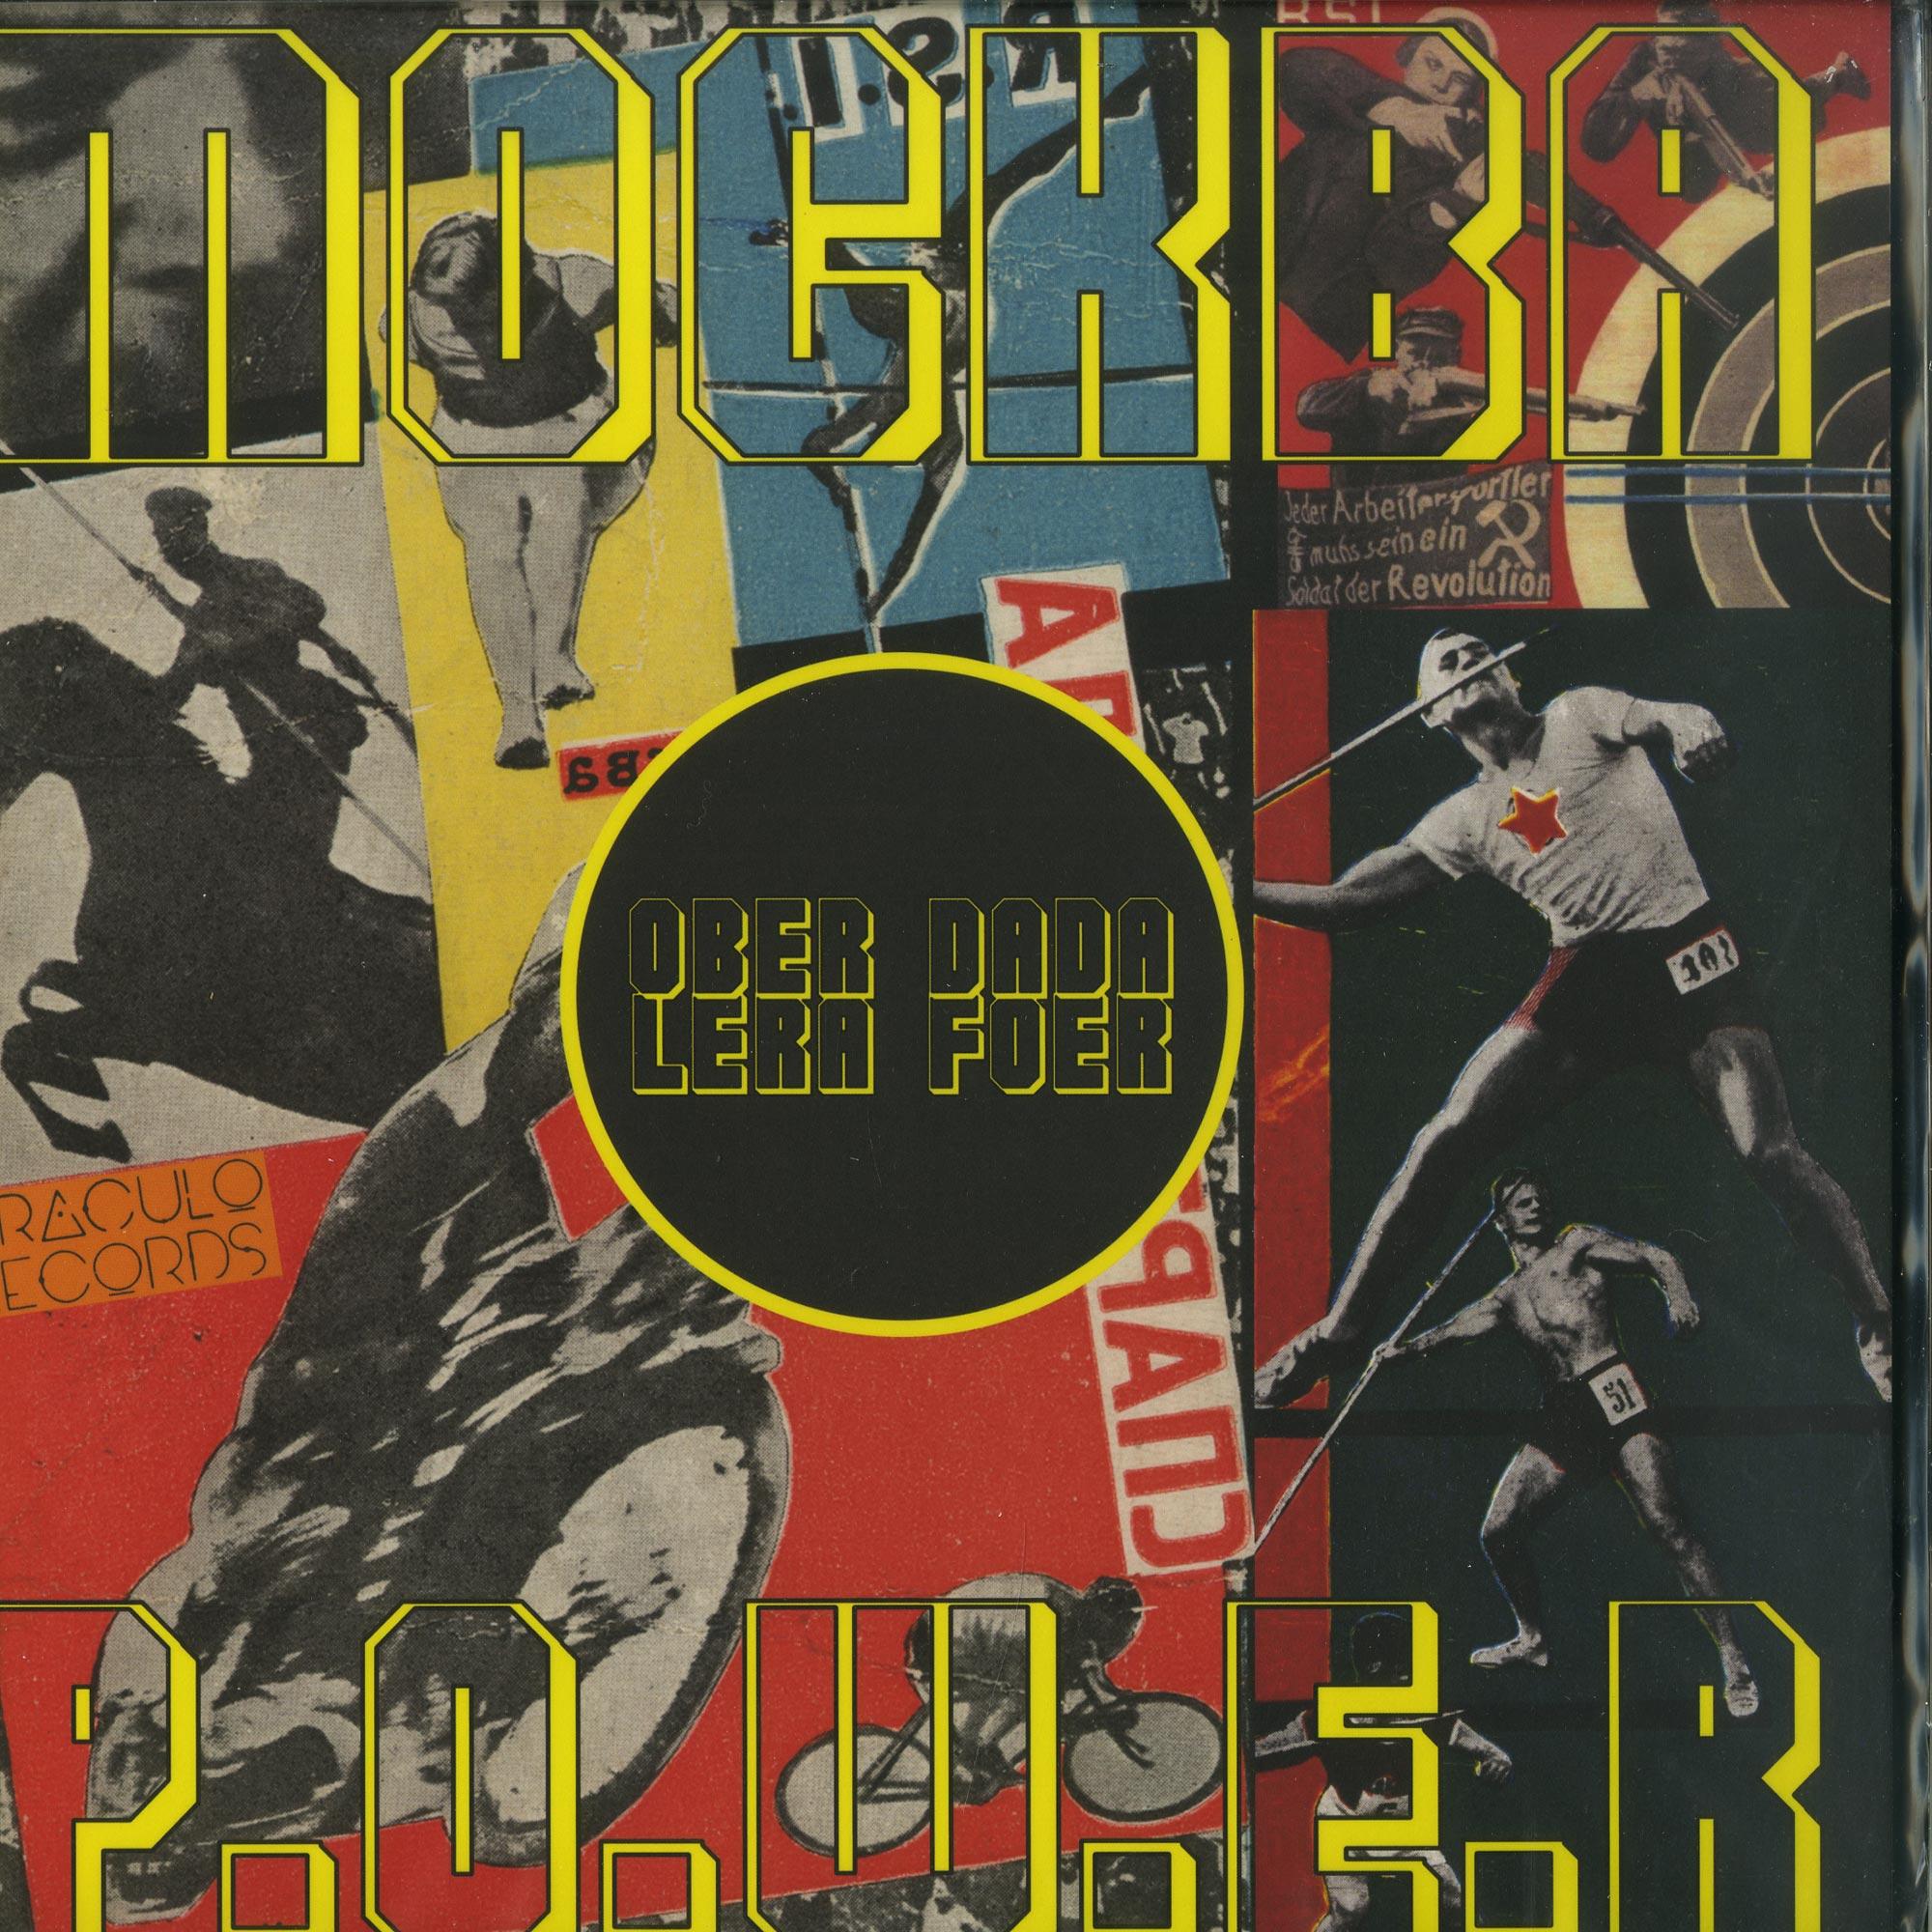 Ober Dada & Lera Foer - MOCKBA P.O.W.E.R.